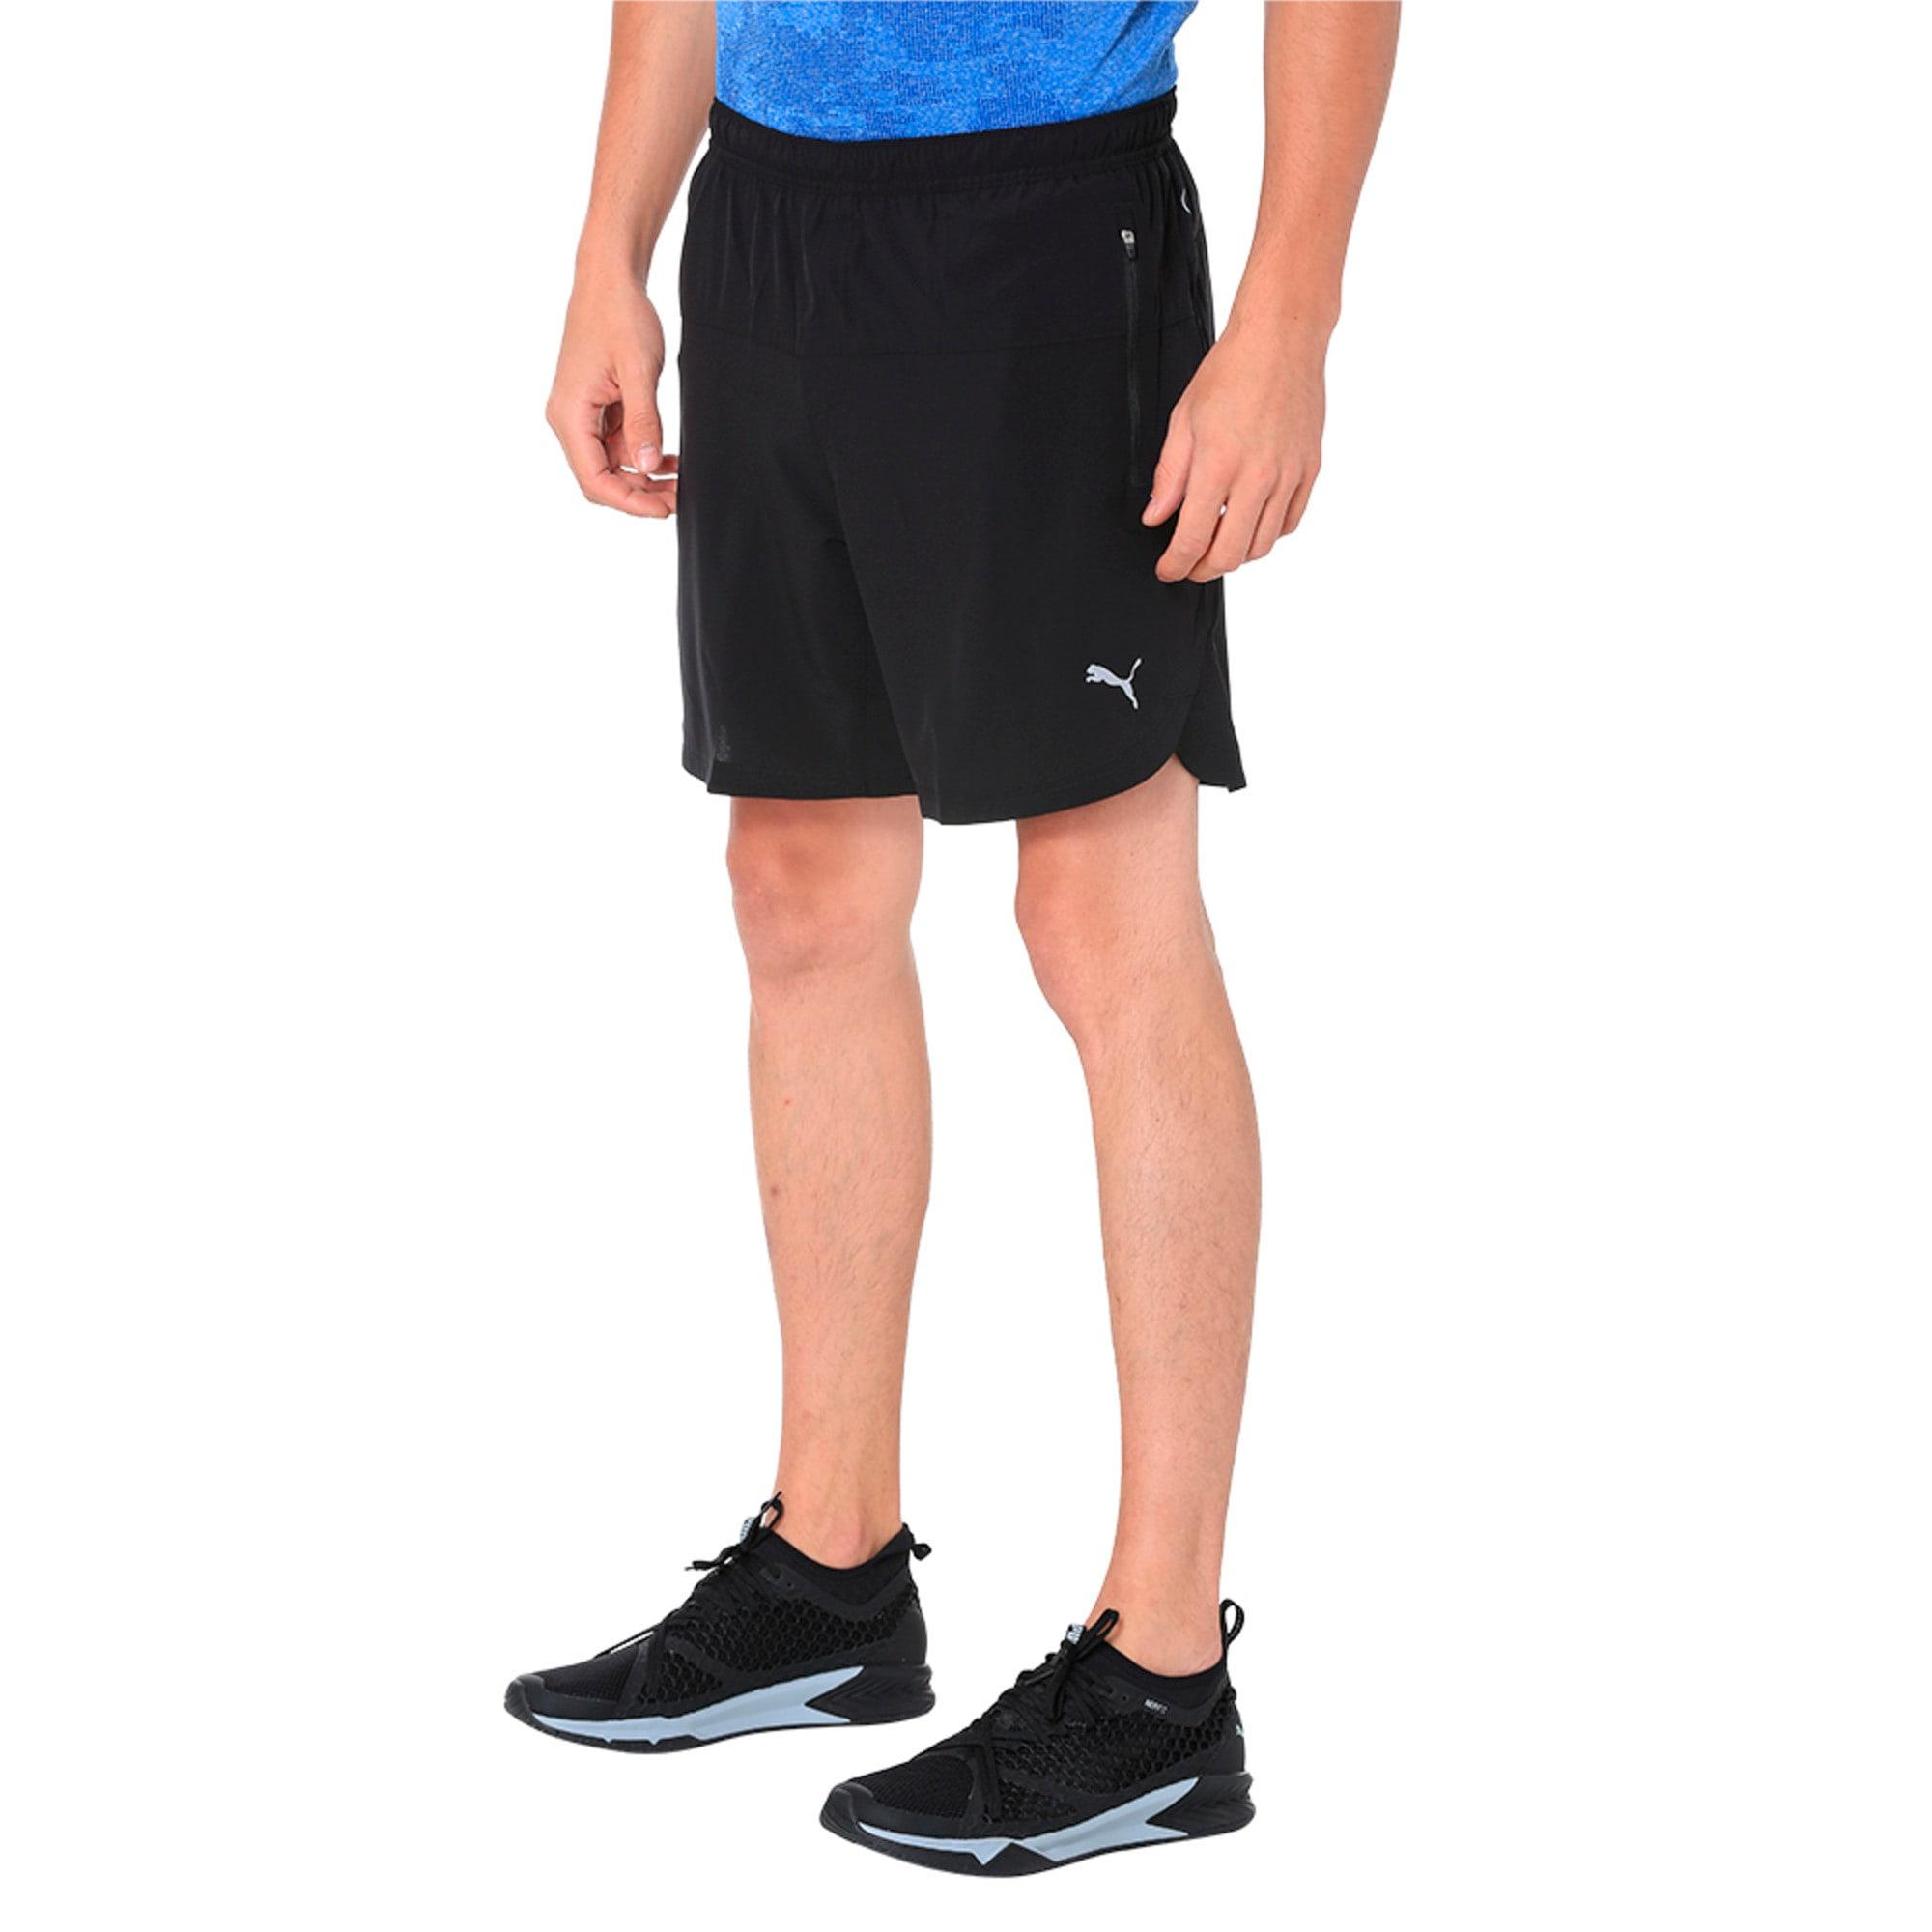 Thumbnail 1 of Pace 7'' Men's Running Shorts, Puma Black, medium-IND